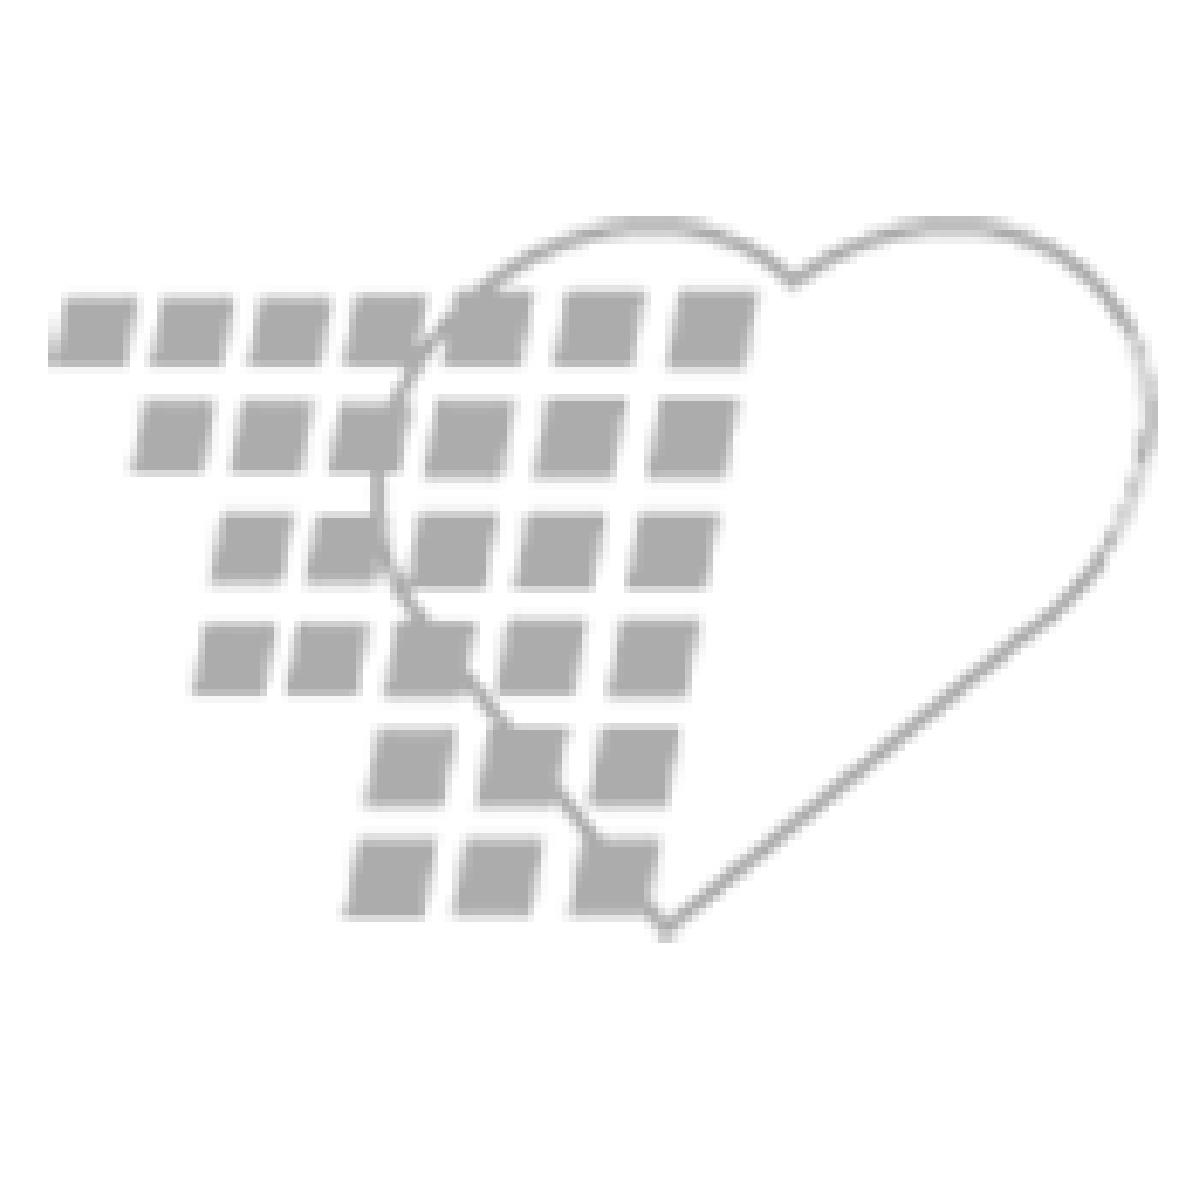 02-92-1211 - Baseline® Economy Plastic Skinfold Caliper 8.5 x 0.5 x 3.5 Inch